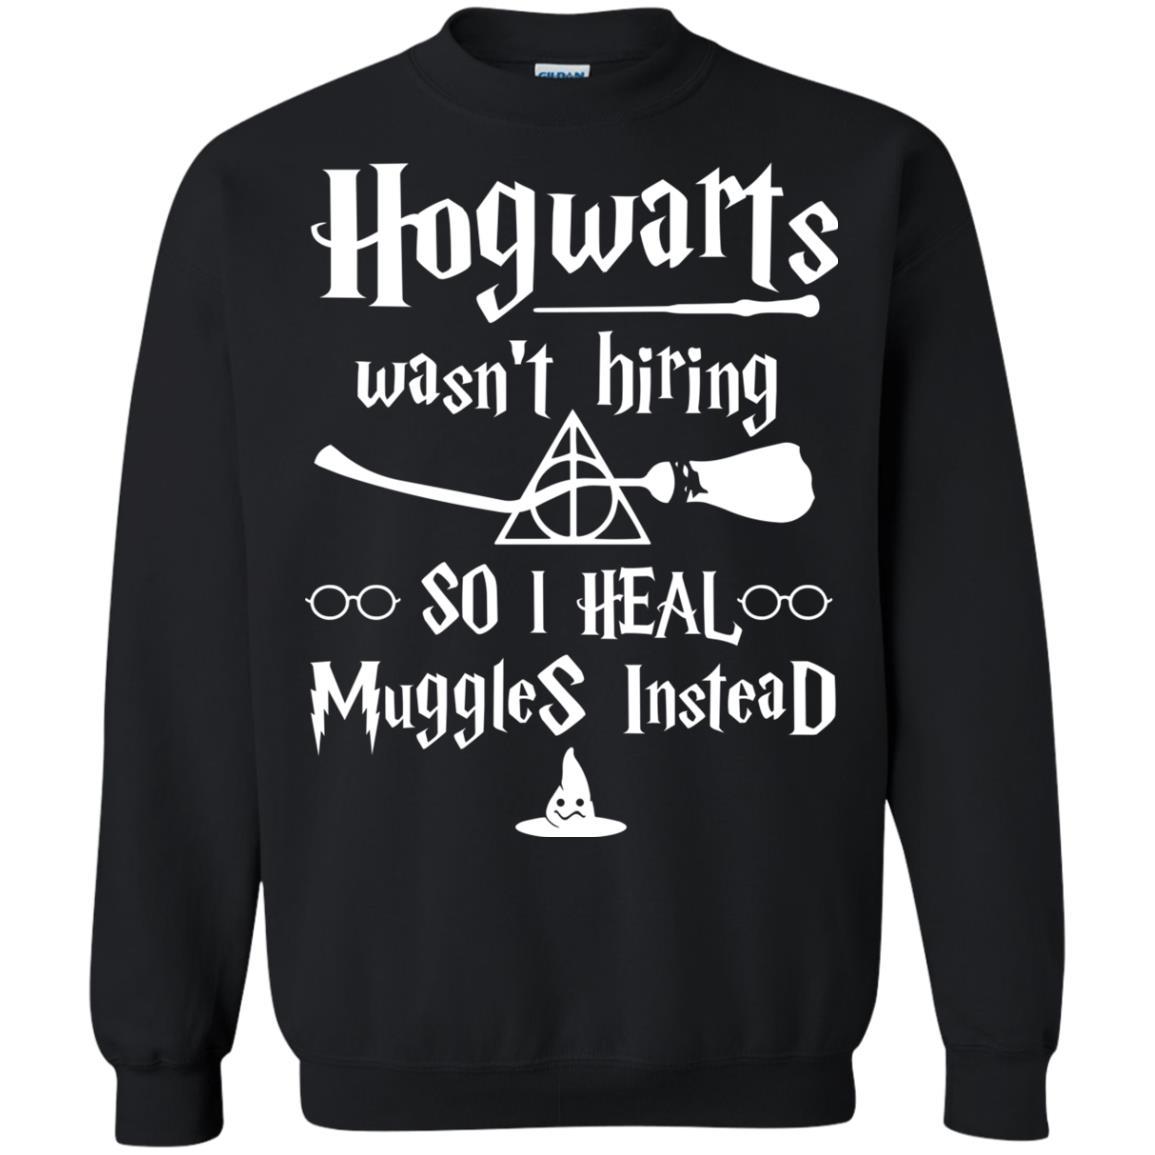 image 5003 - Hogwarts wasn't hiring so I heal Muggles instead shirt, hoodie